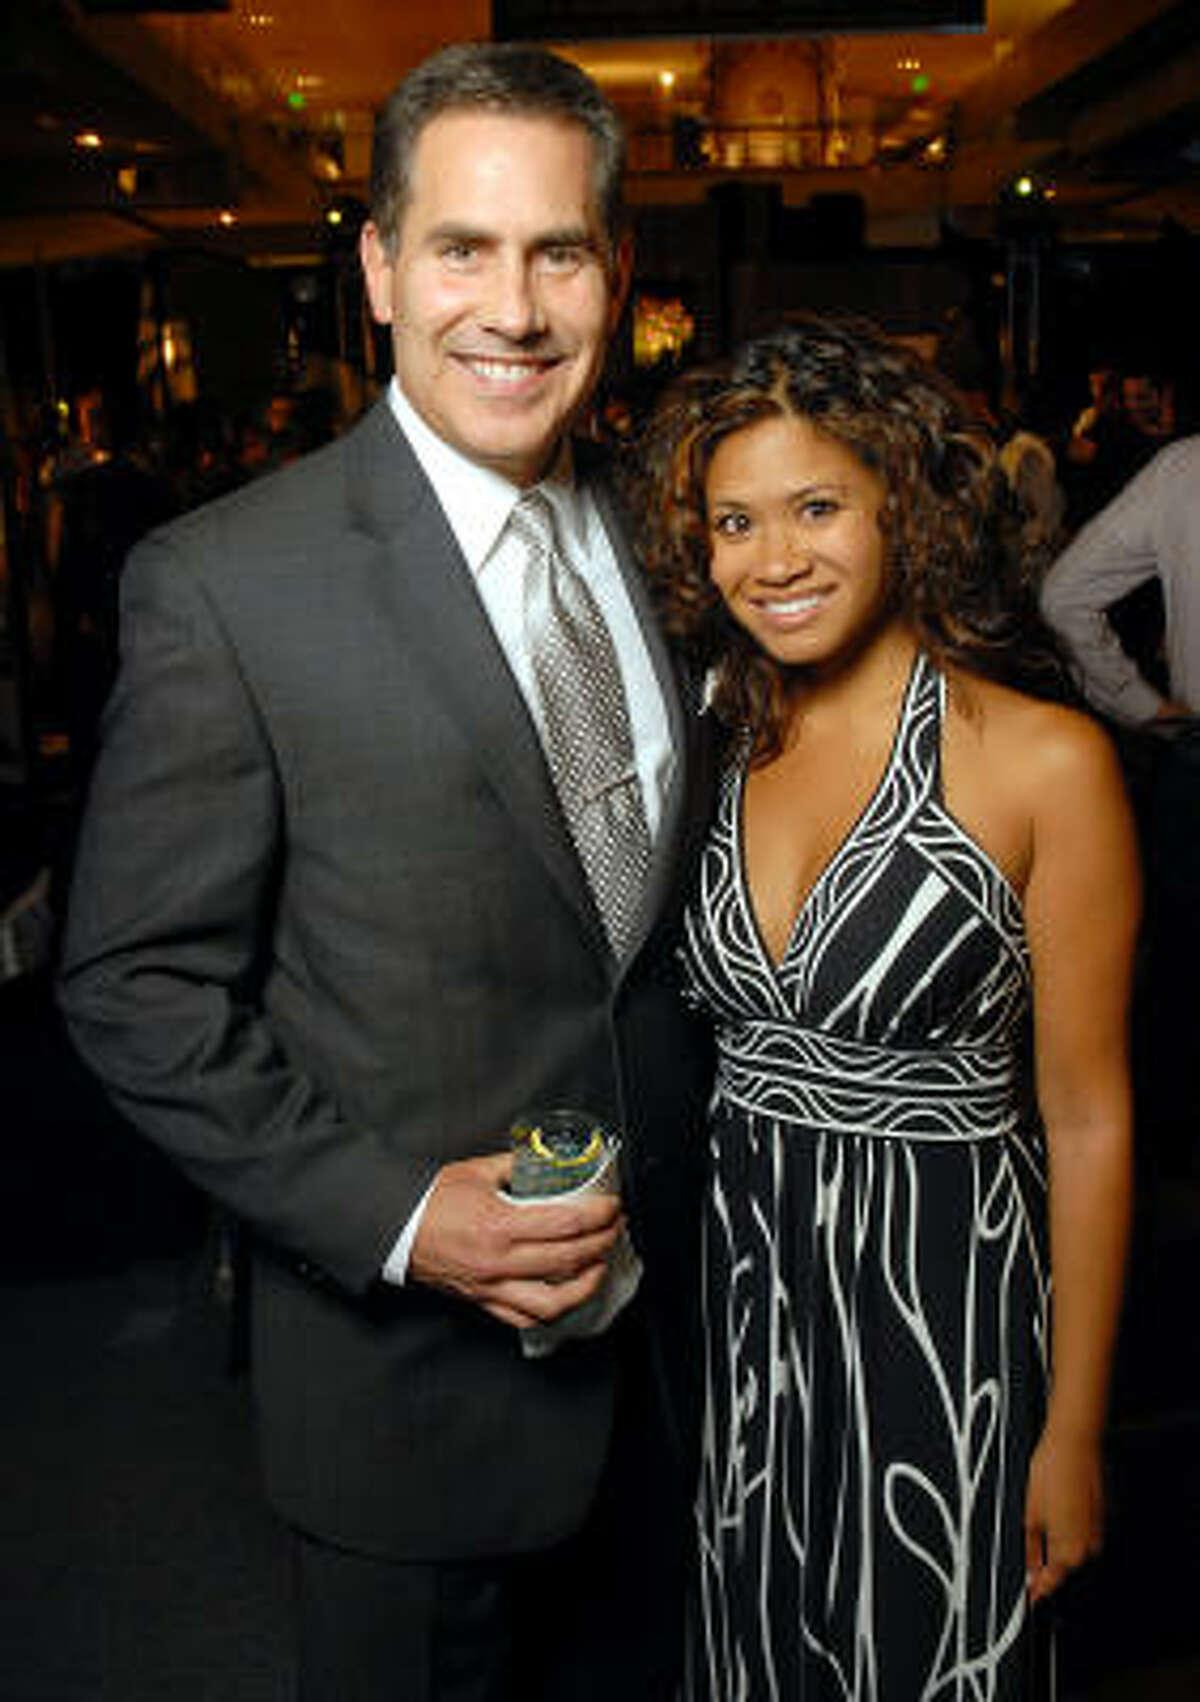 David Golemon and Jennifer De Castro